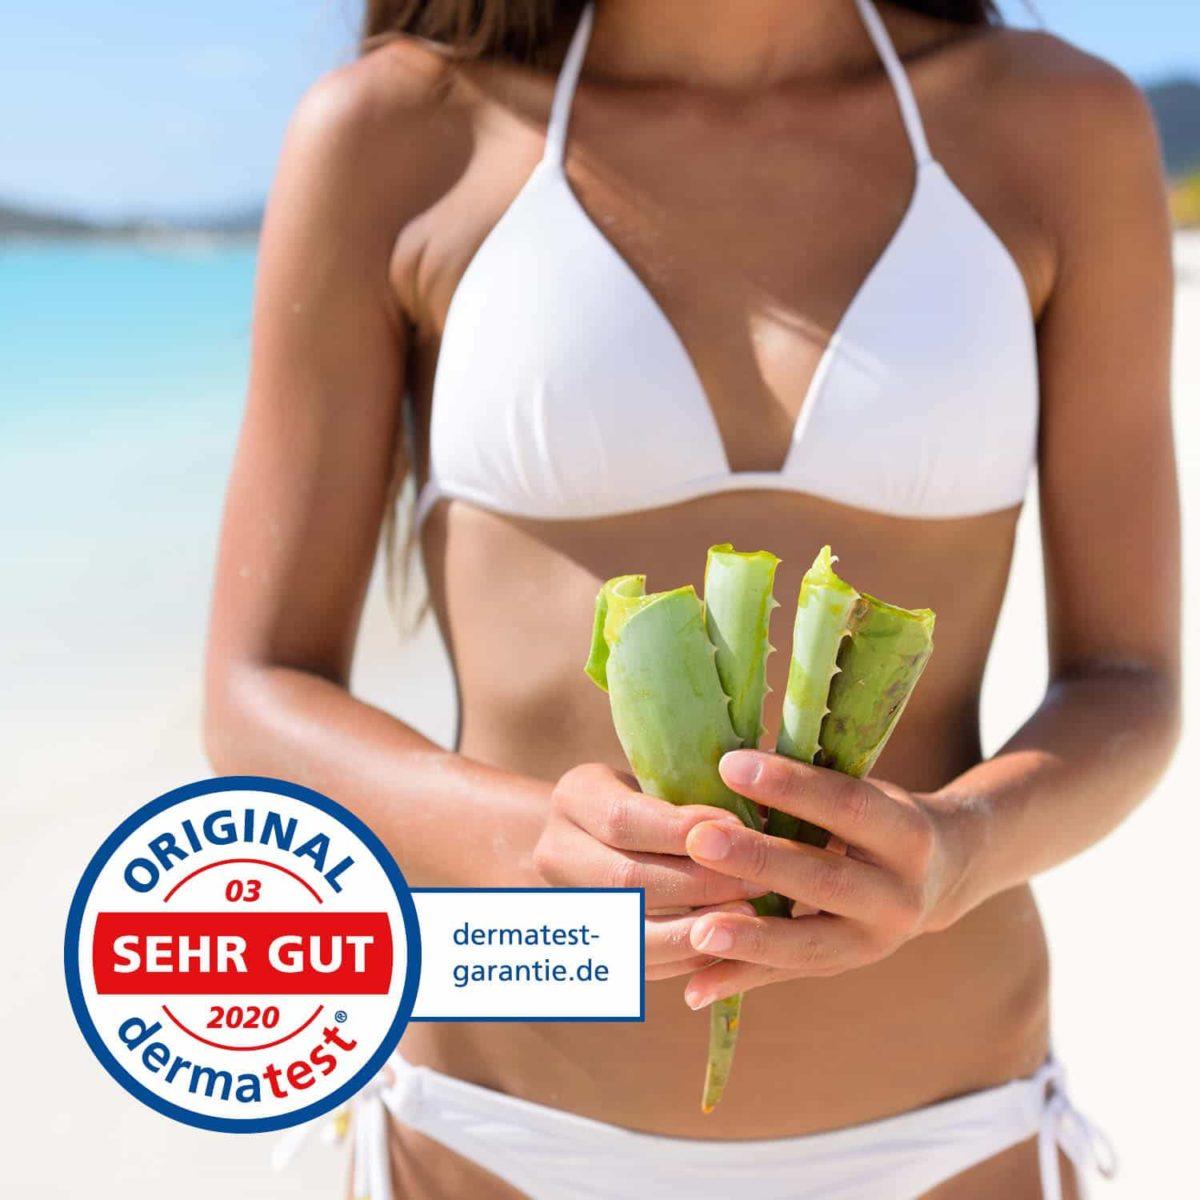 Casida Aloe Vera Gel Haut & Haare 16573212 PZN Apotheke Hautpflege After Sun (3)